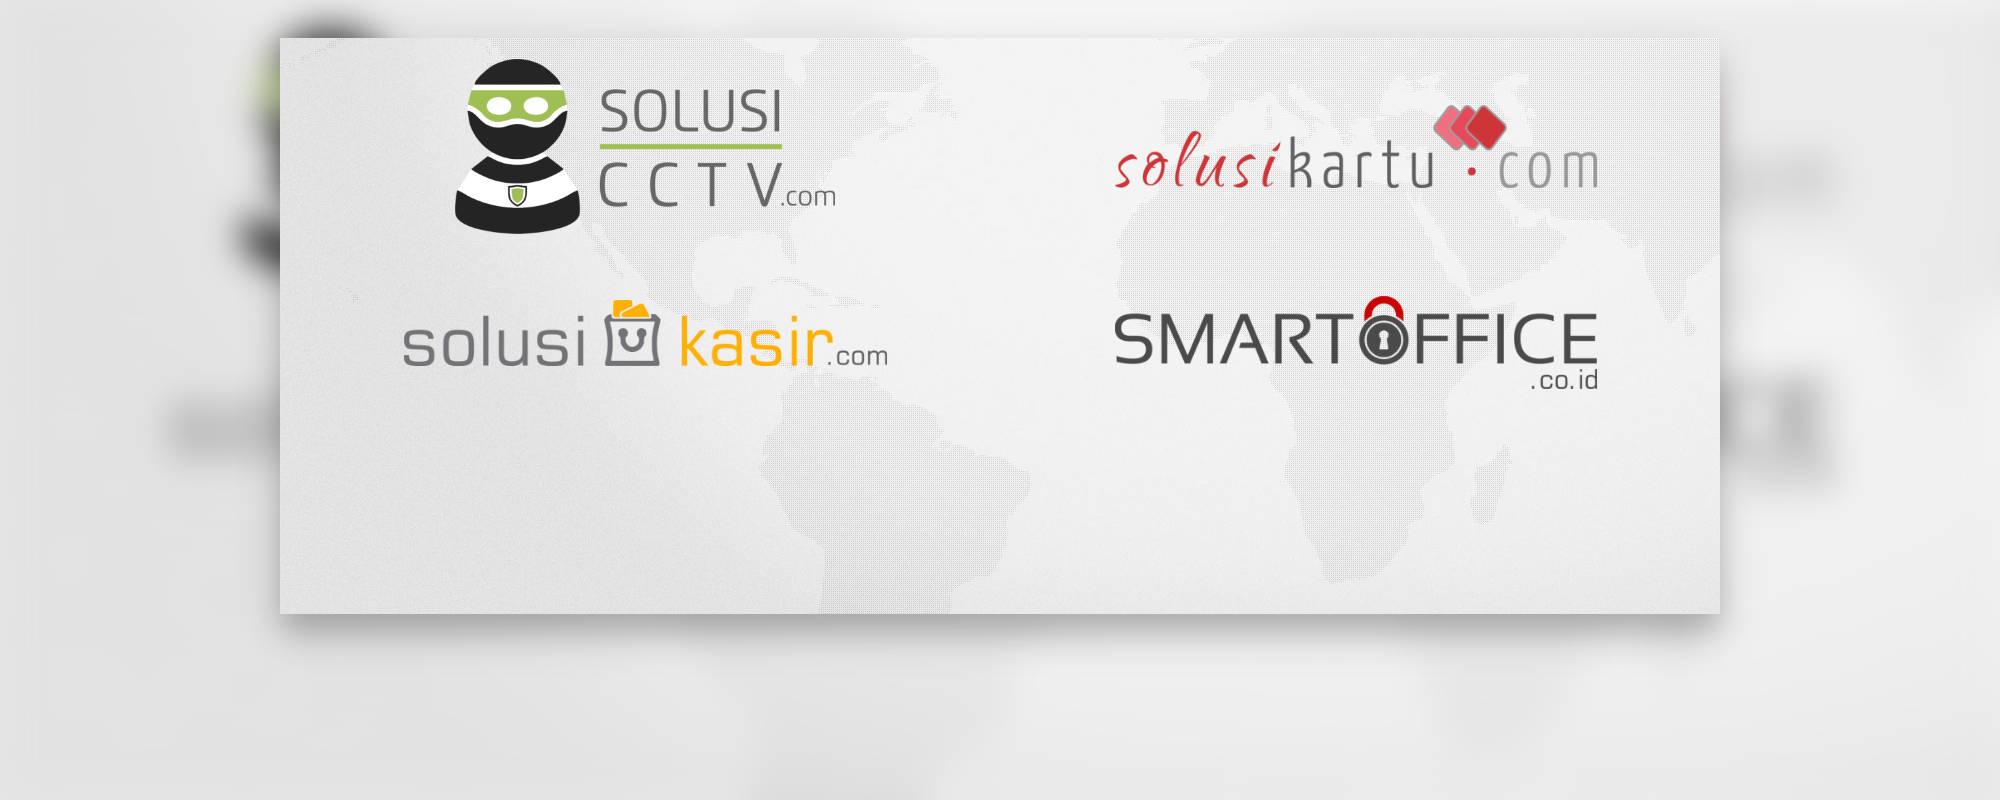 lowongan kerja administrasi, sales, marketing, web desainer, programmer di netfocus gading serpong